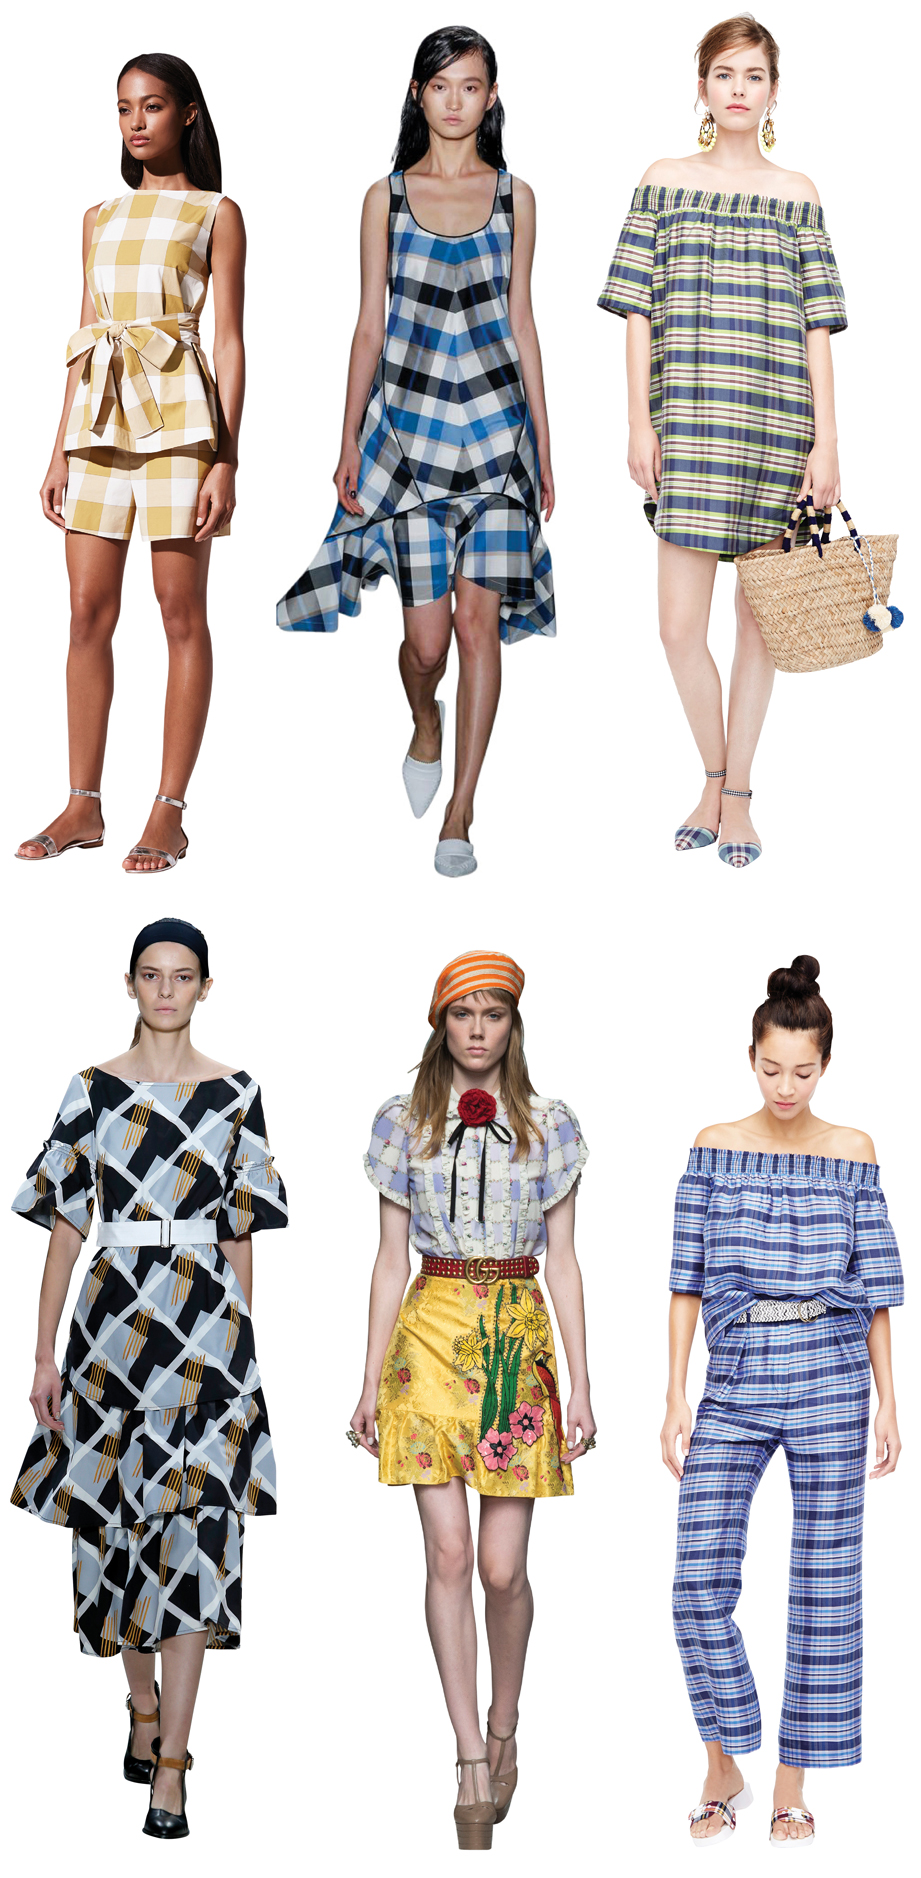 Spring/Summer 2016 trends Chessboard Pattern